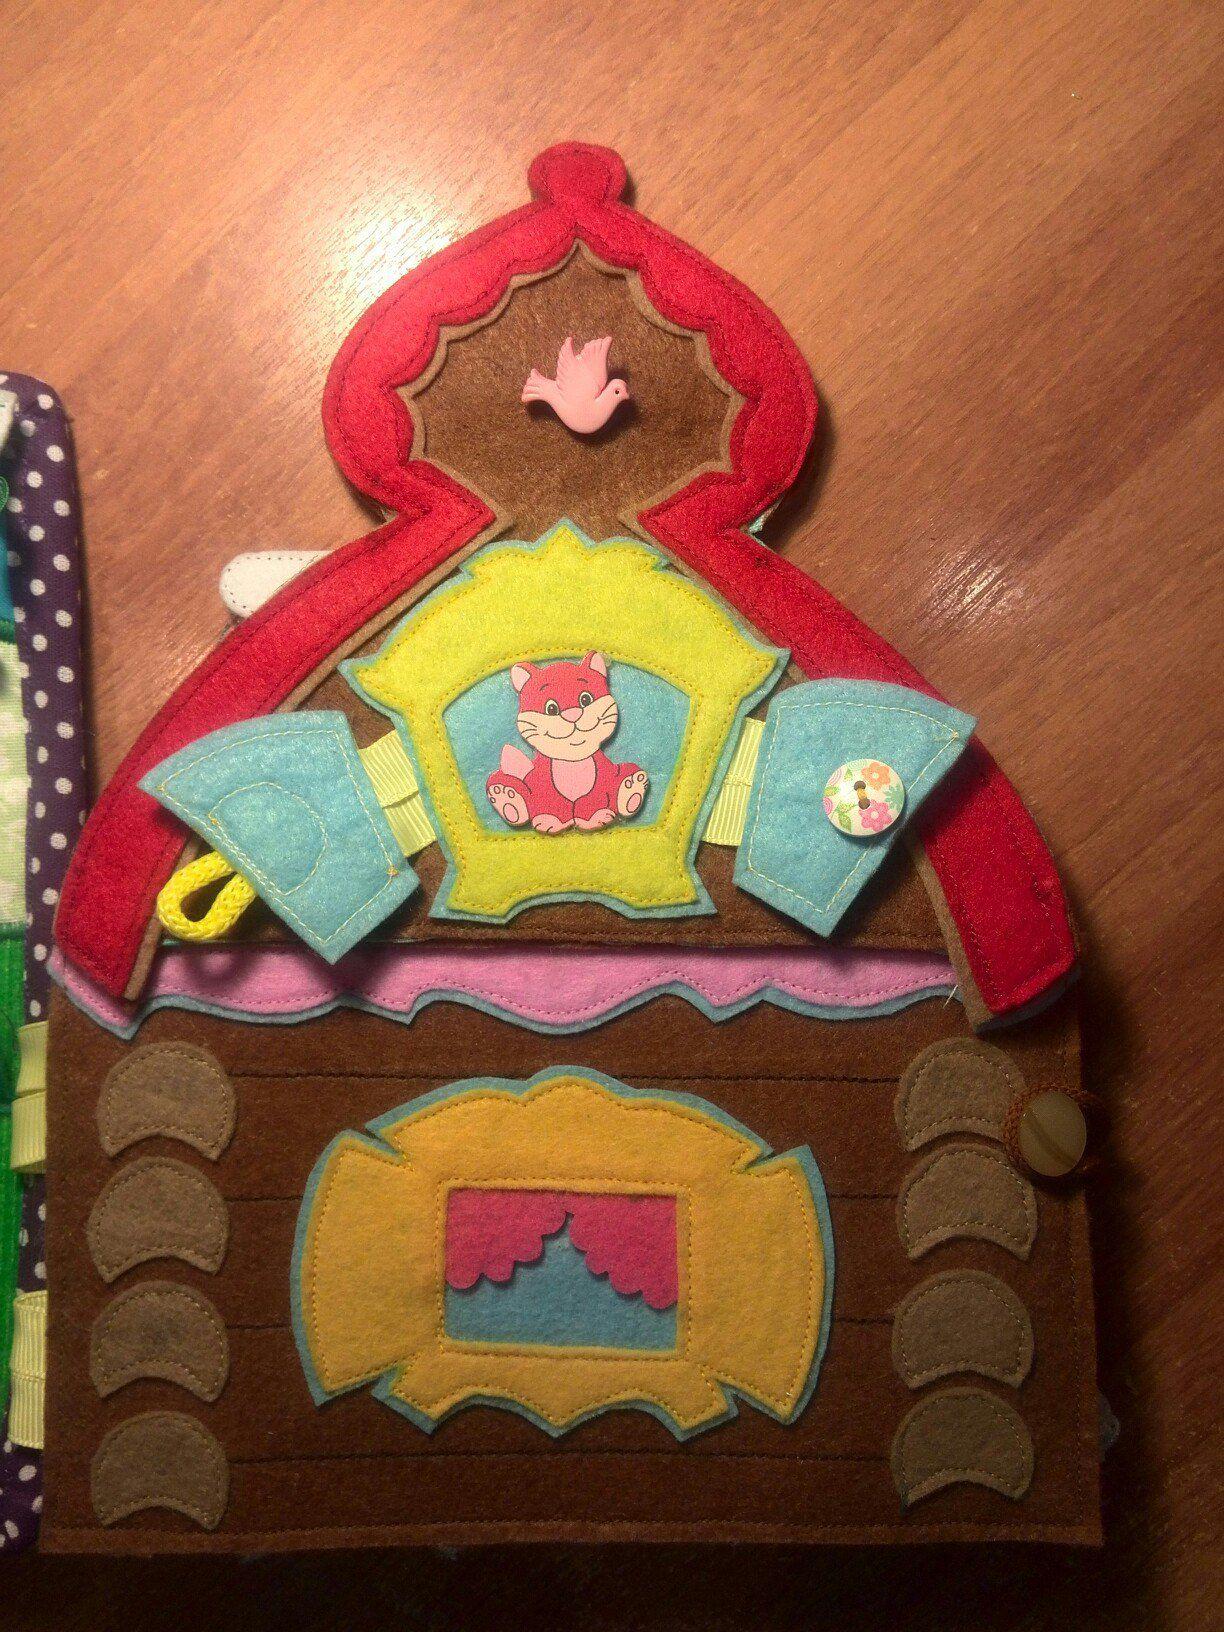 сказки игрушки развивашки малышам фетр